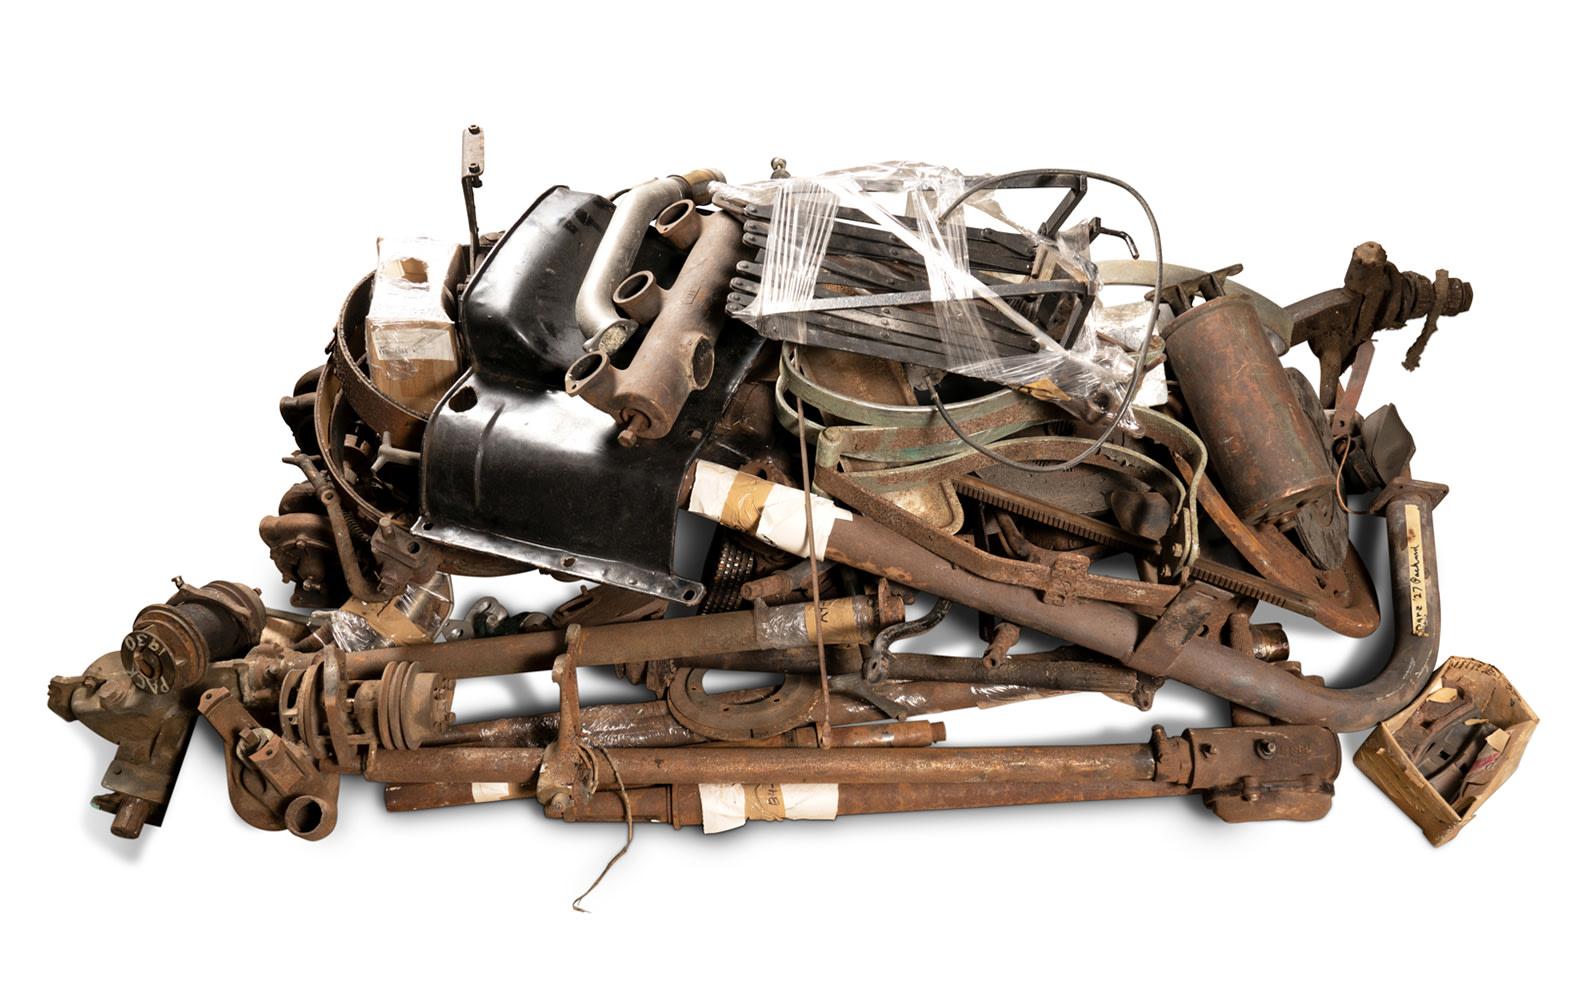 Prod/O21E - Phil Hill C 2021/C0143_Assorted Vintage Vehicle Components/C0143_Vintage_Vehicle_Components_11_tzdehp